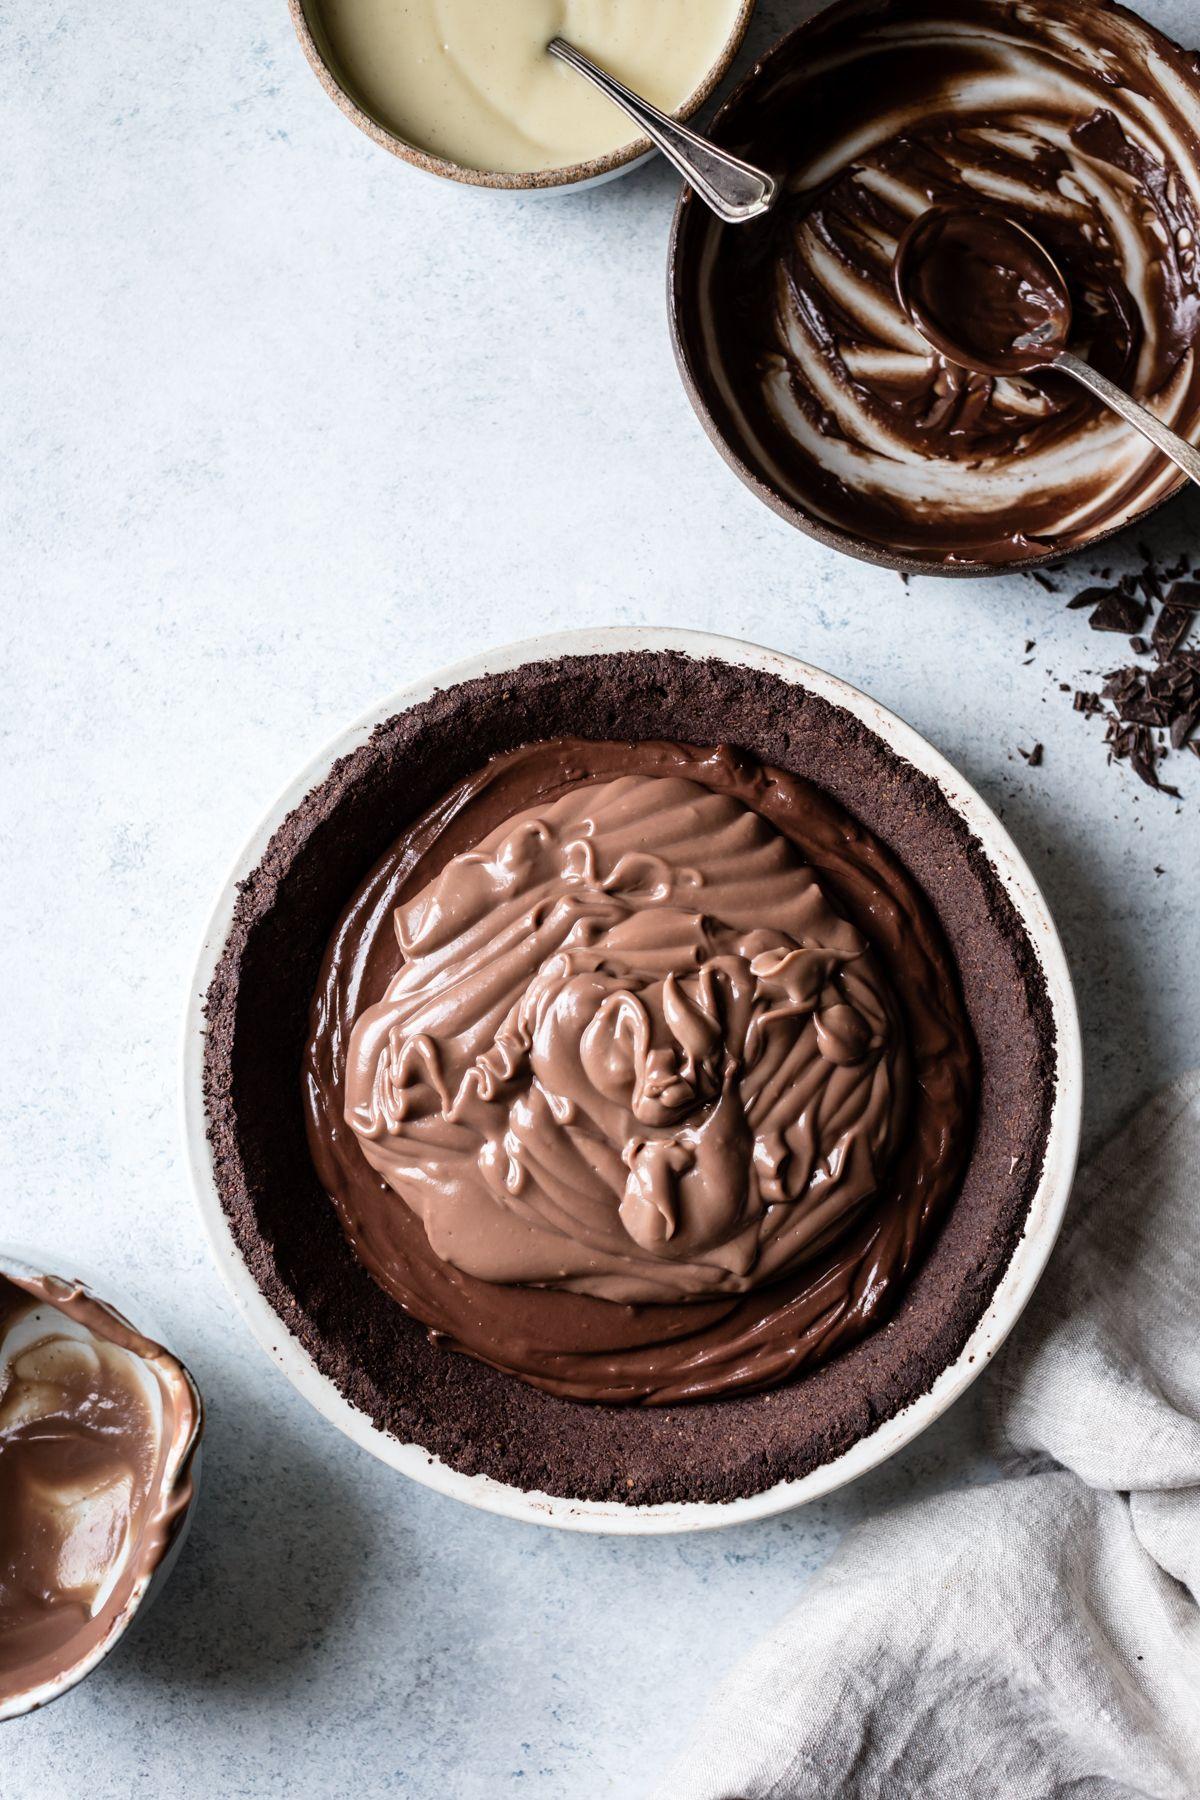 Gluten-Free Triple Chocolate Layer Pie in a Cocoa-Hazelnut Crust